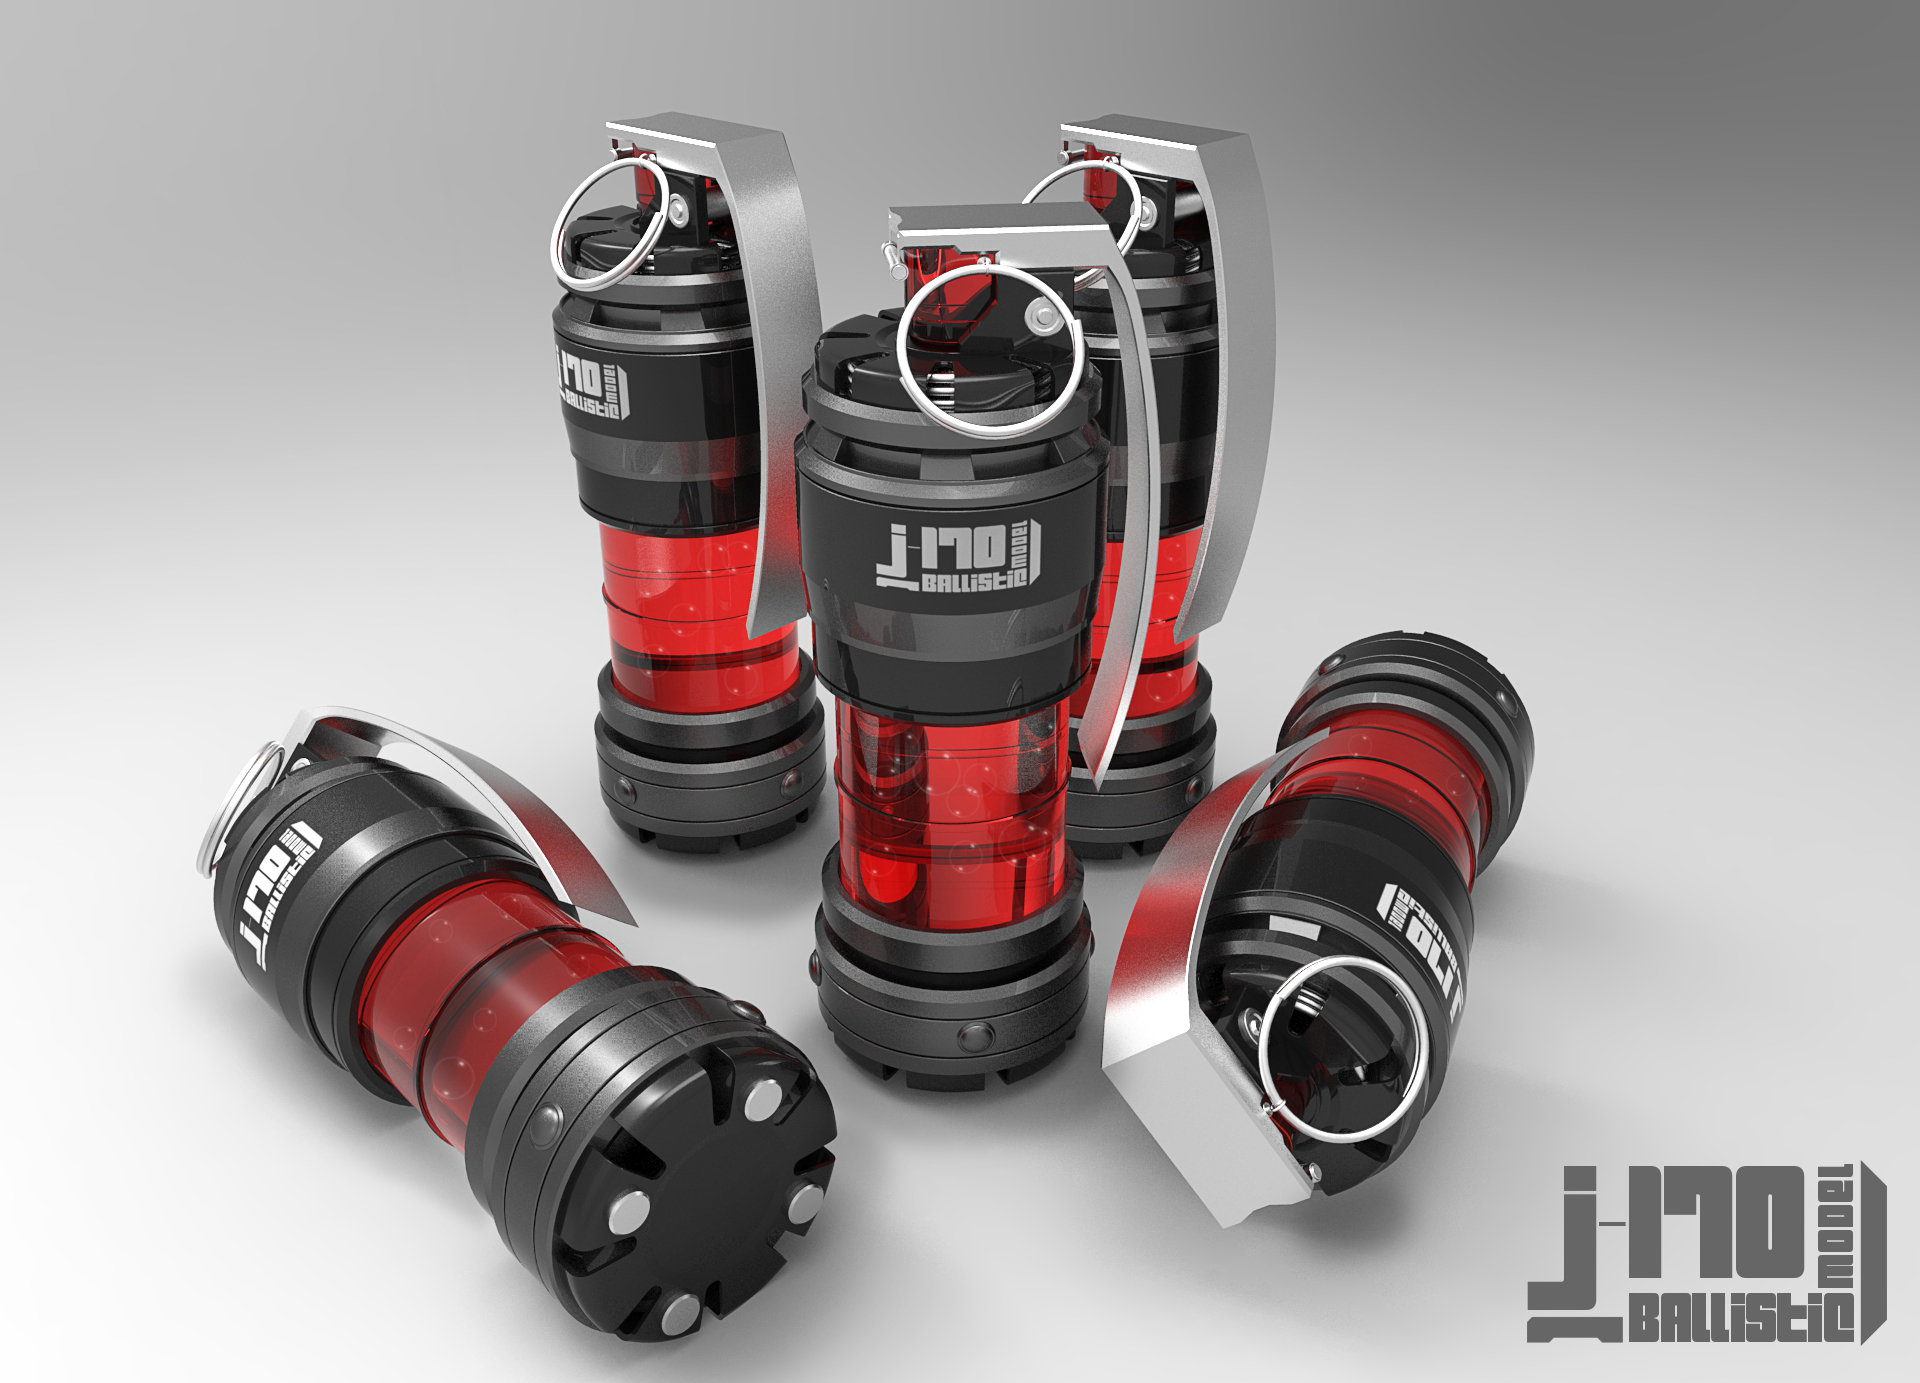 Jarlan perez j170 grenade red